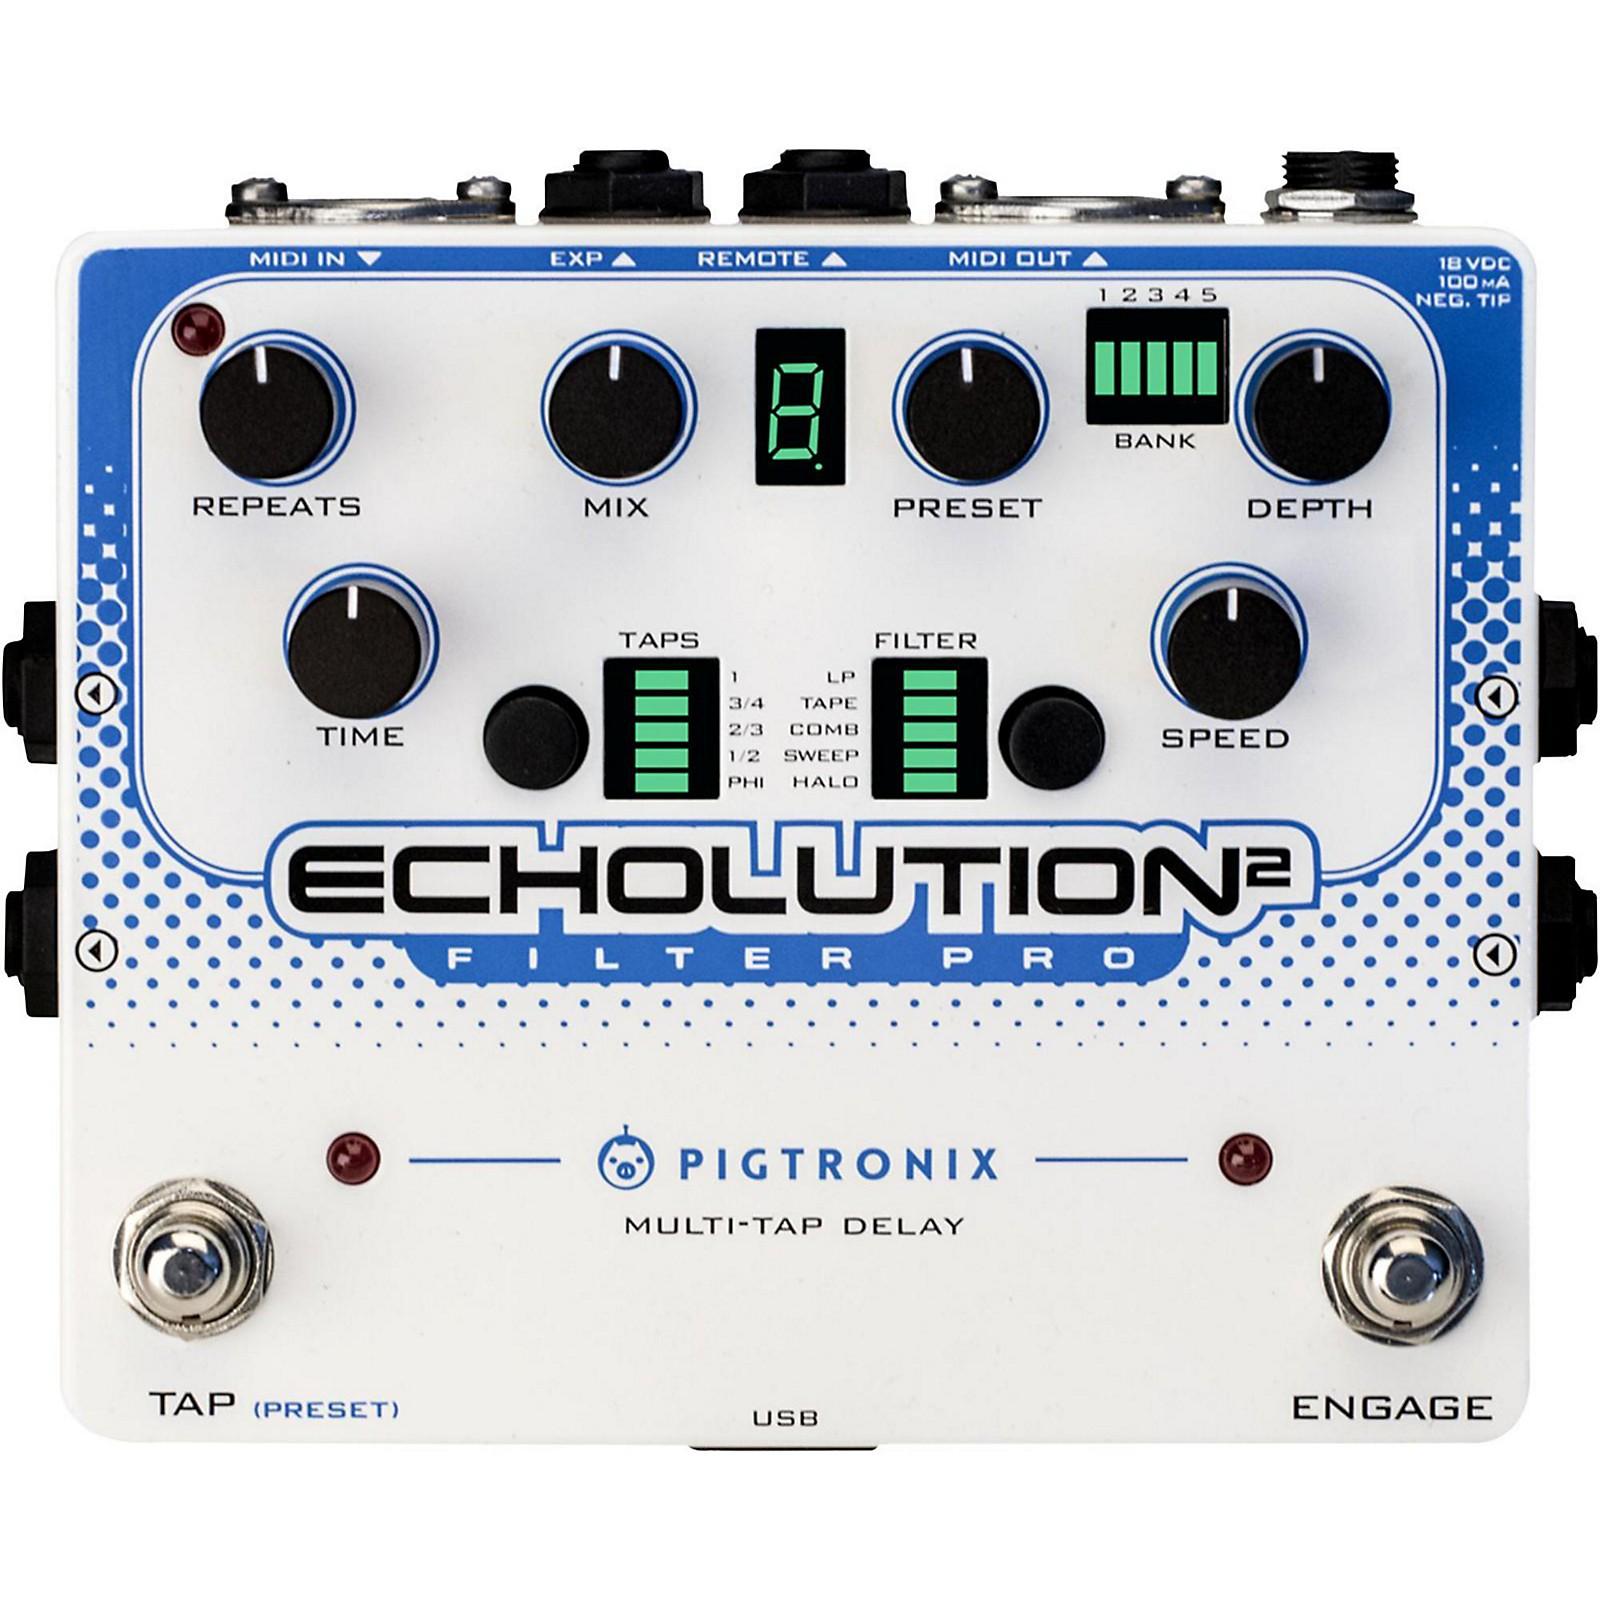 Open Box Pigtronix Echolution 2 Filter Pro Delay Guitar Pedal